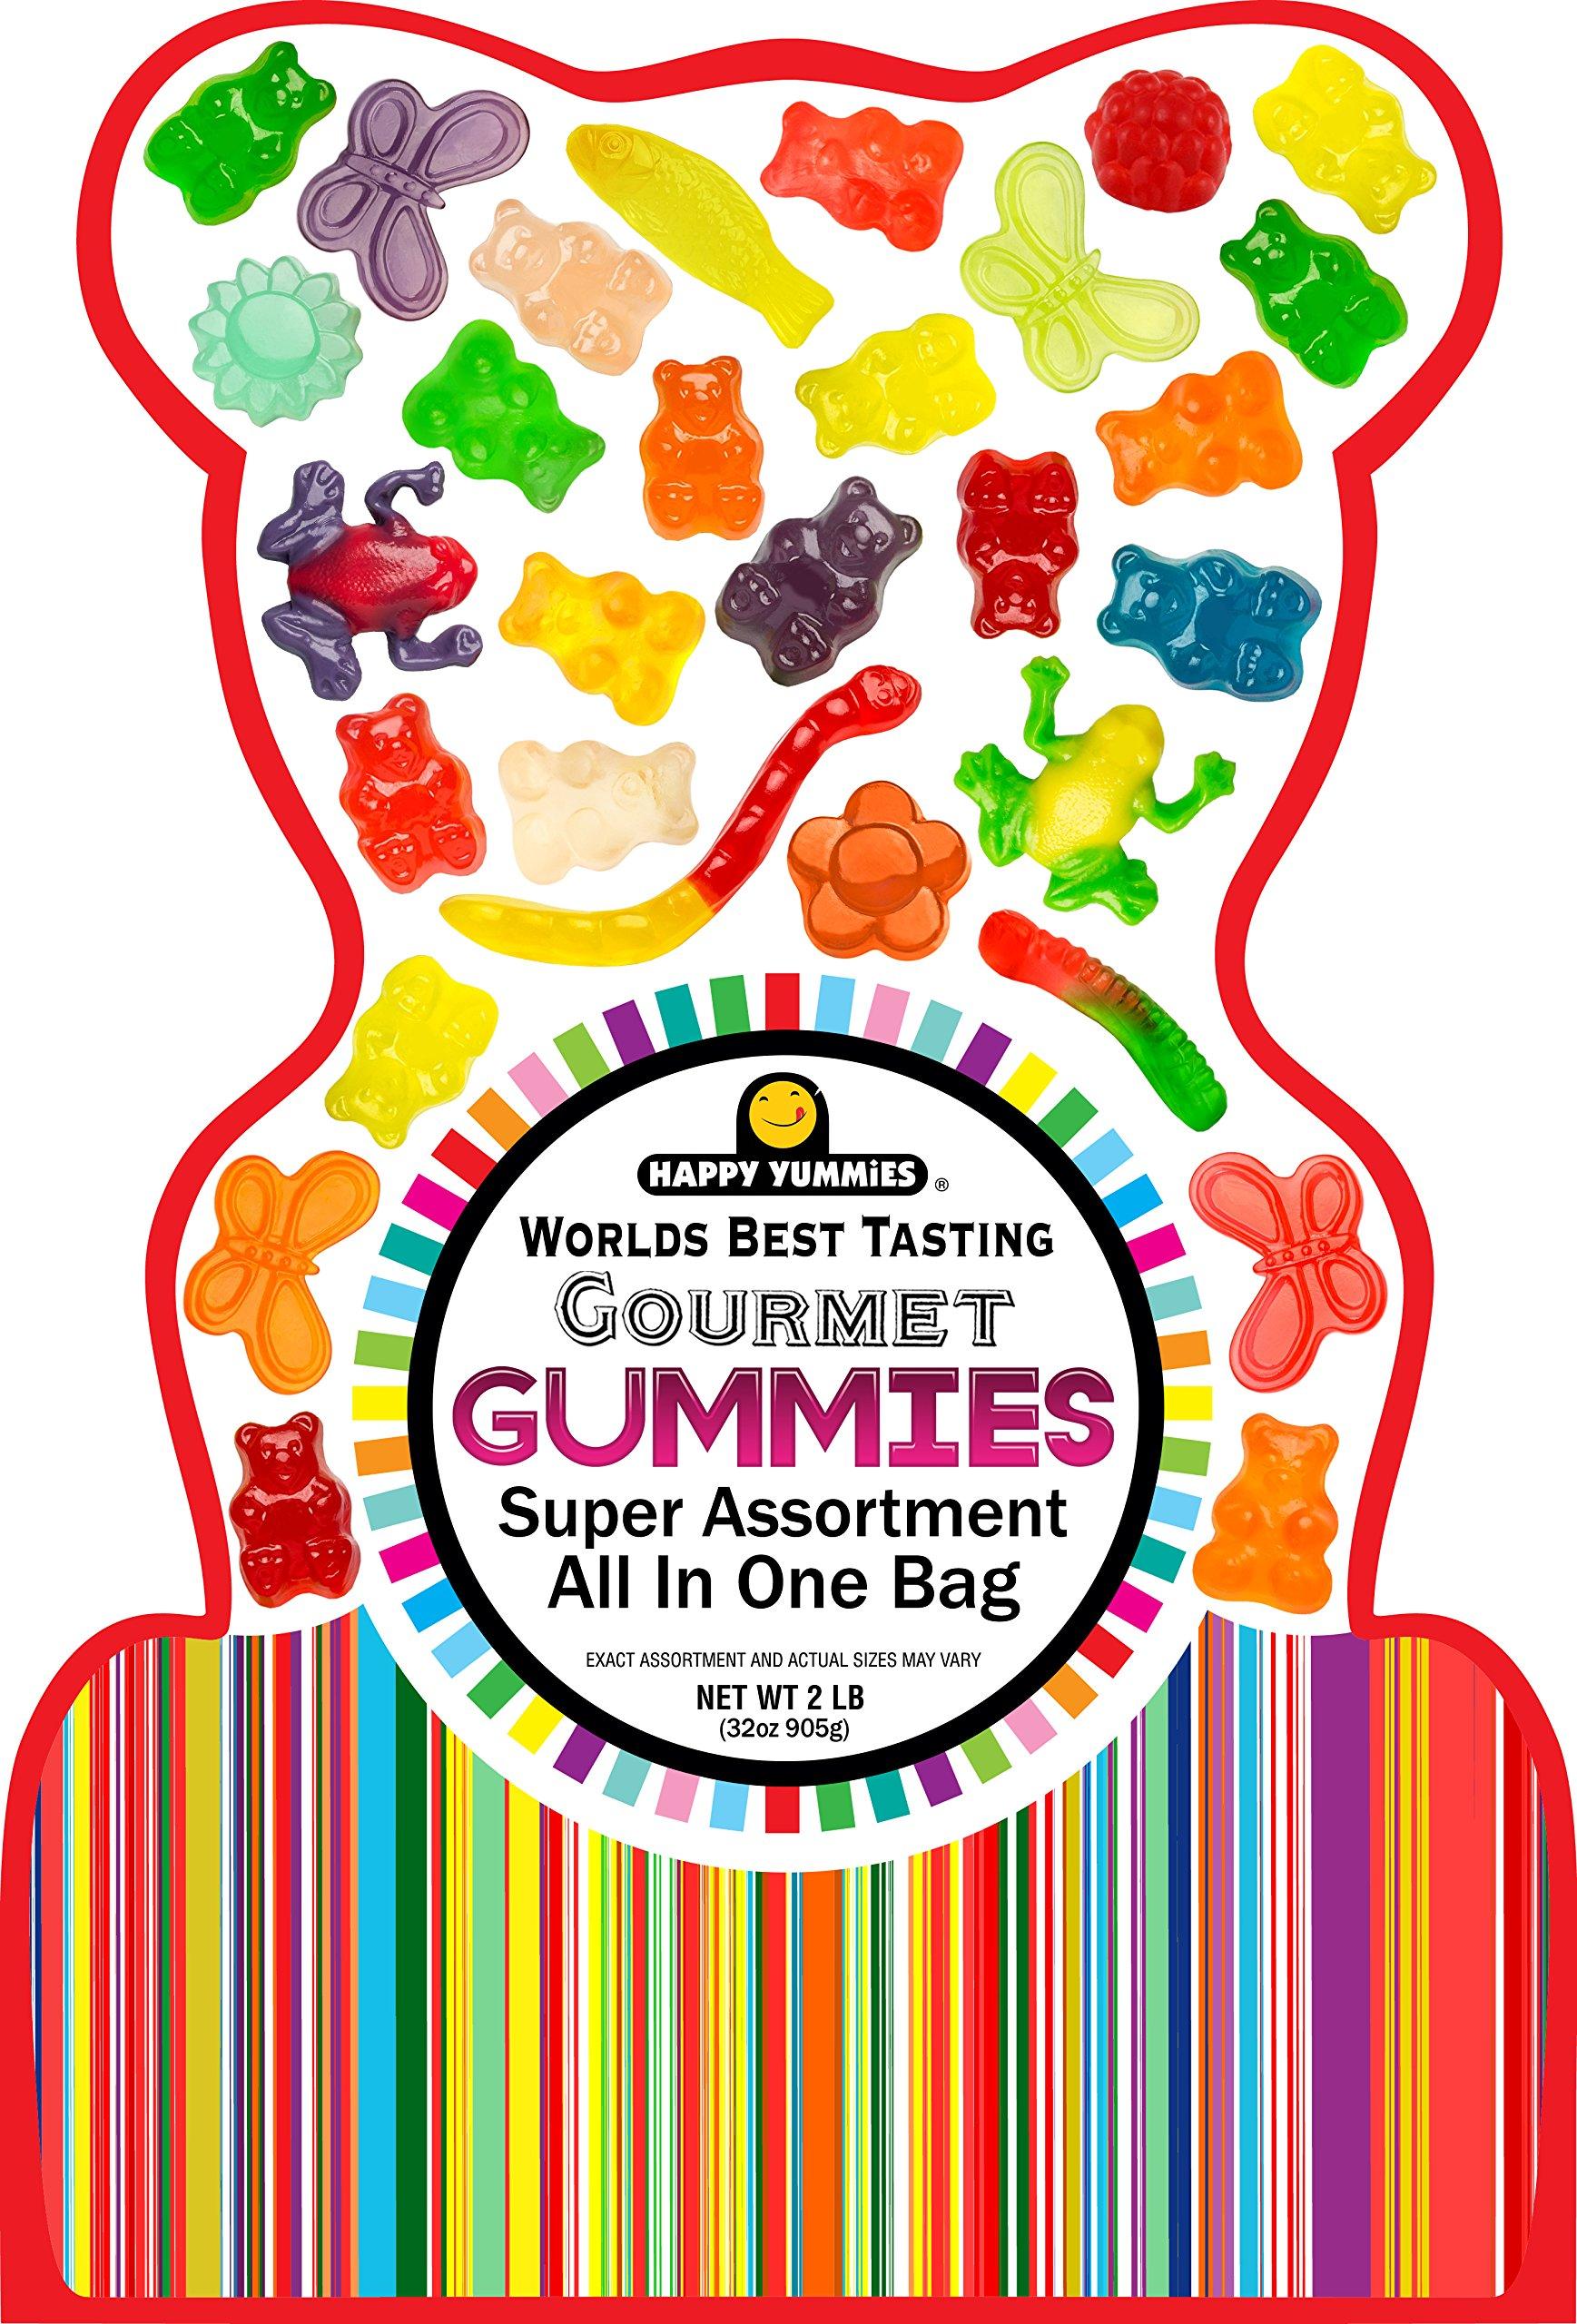 Happy Yummies Worlds Best Tasting Gourmet Gummies All In One Assortment 32oz